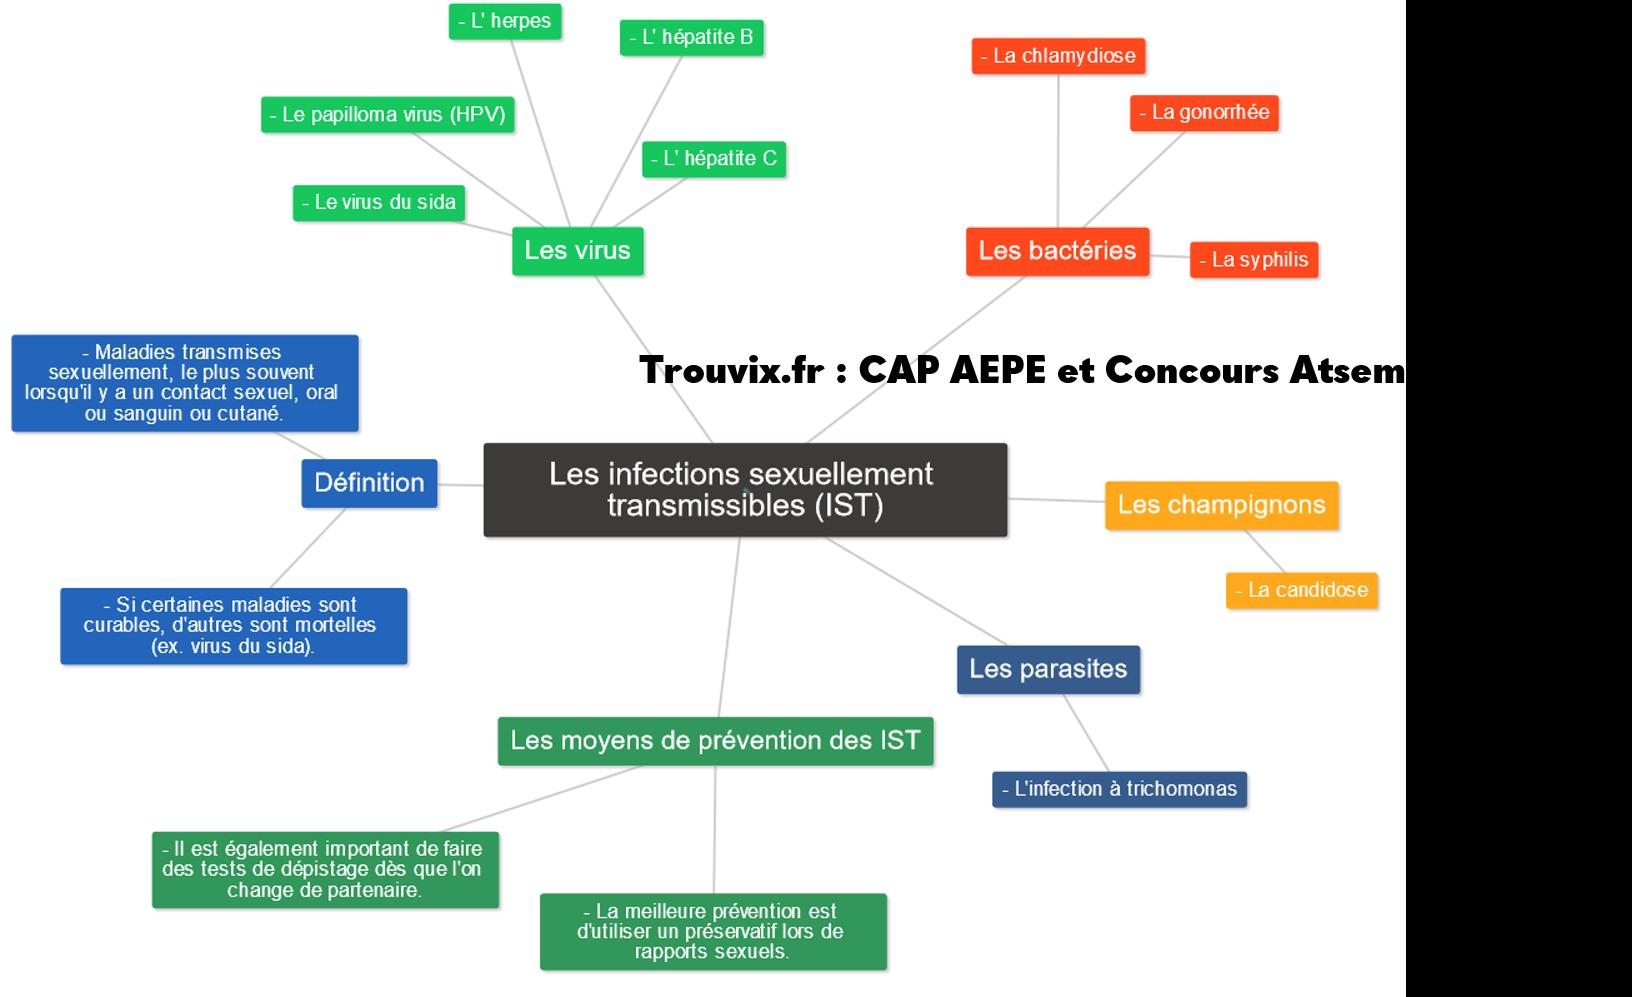 Infections sexuellement transmissibles - IST